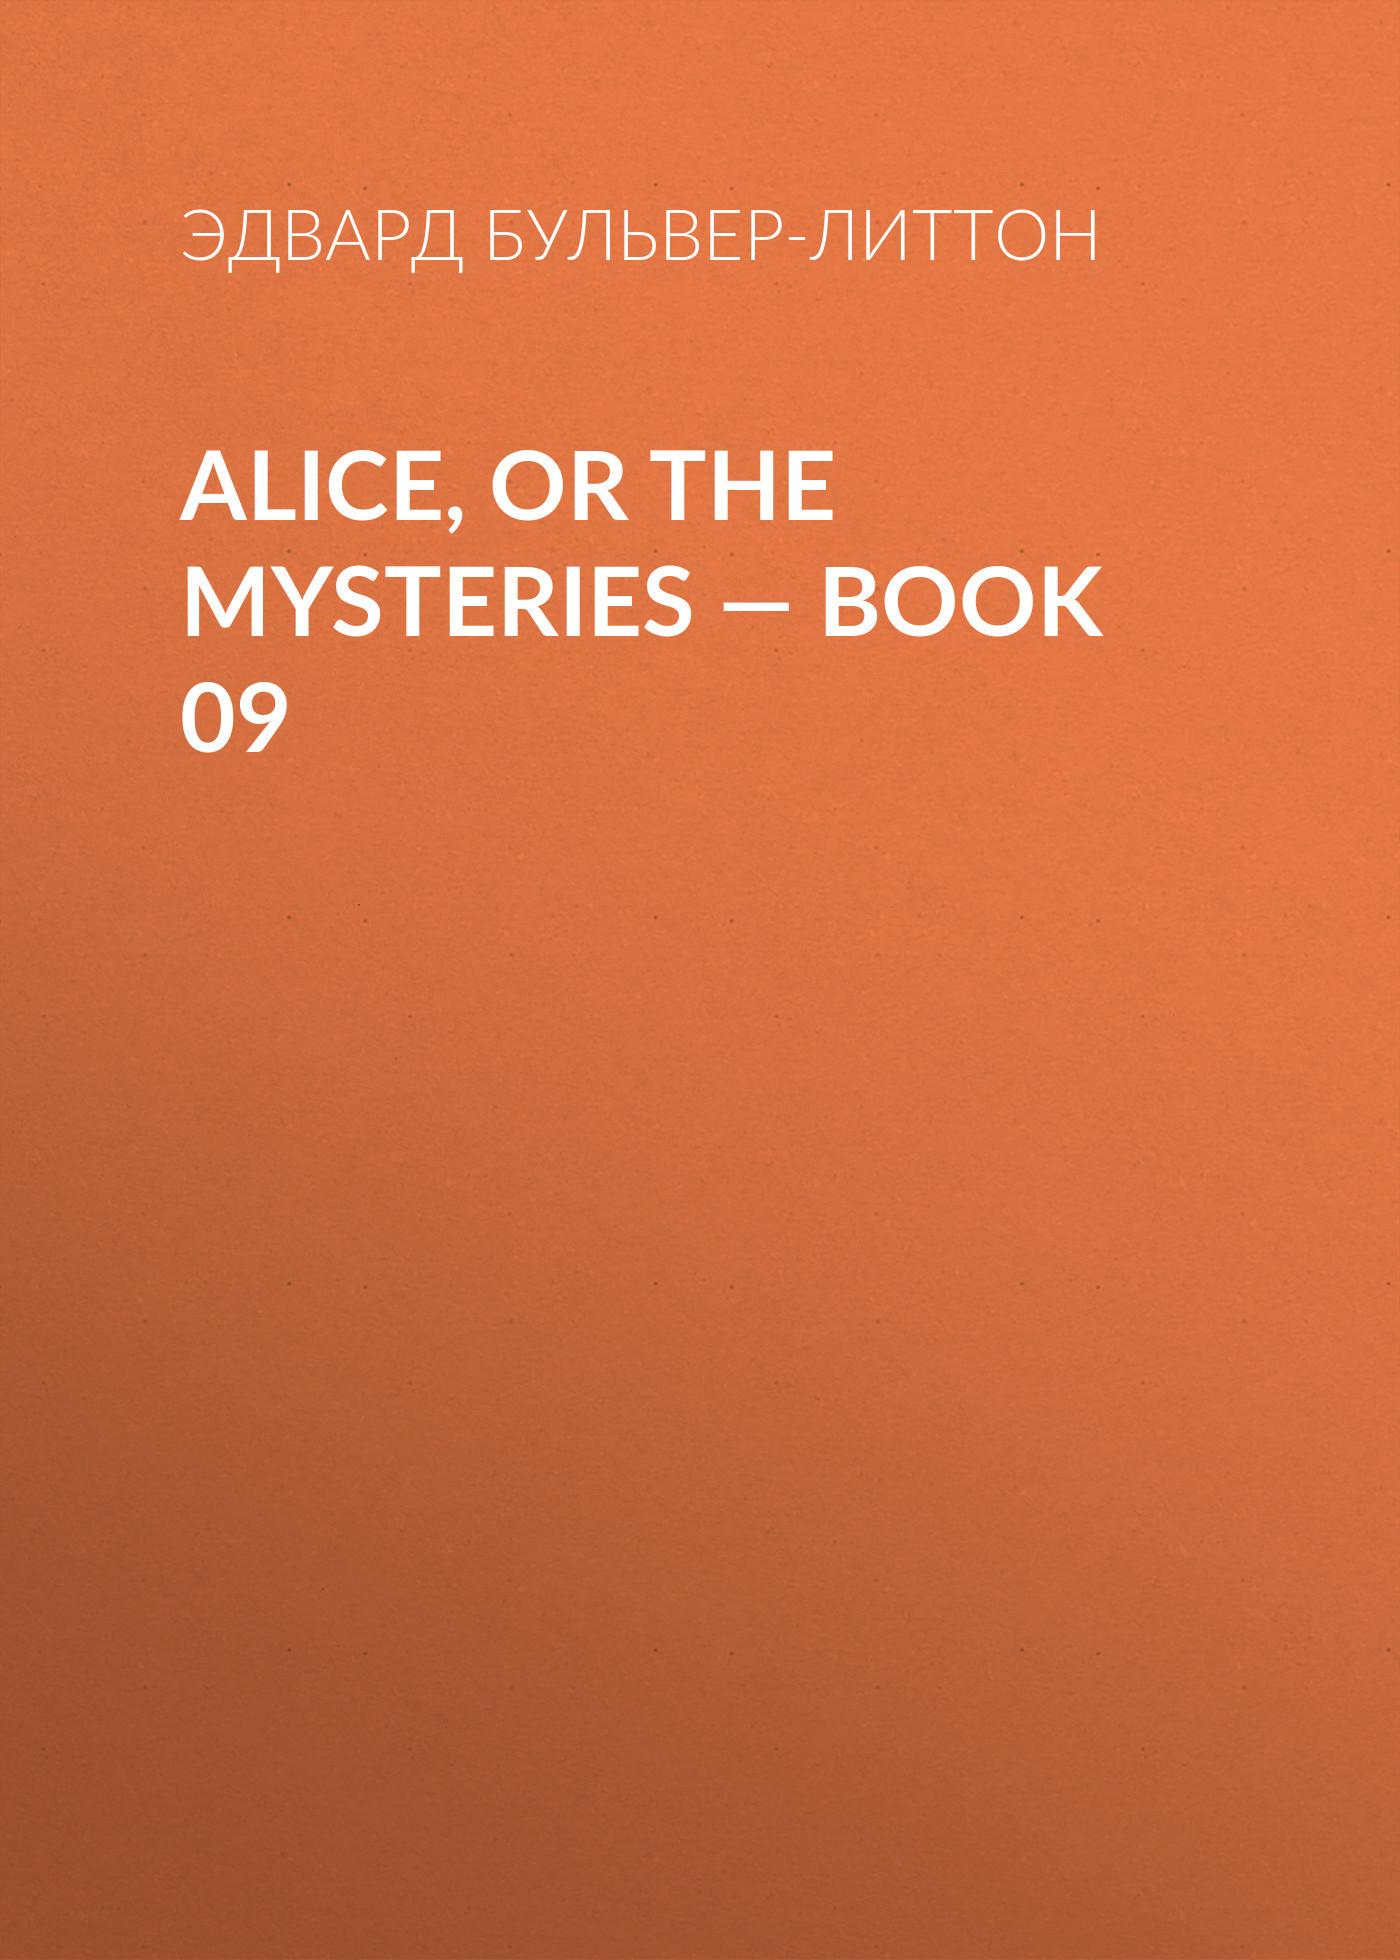 Эдвард Бульвер-Литтон Alice, or the Mysteries — Book 09